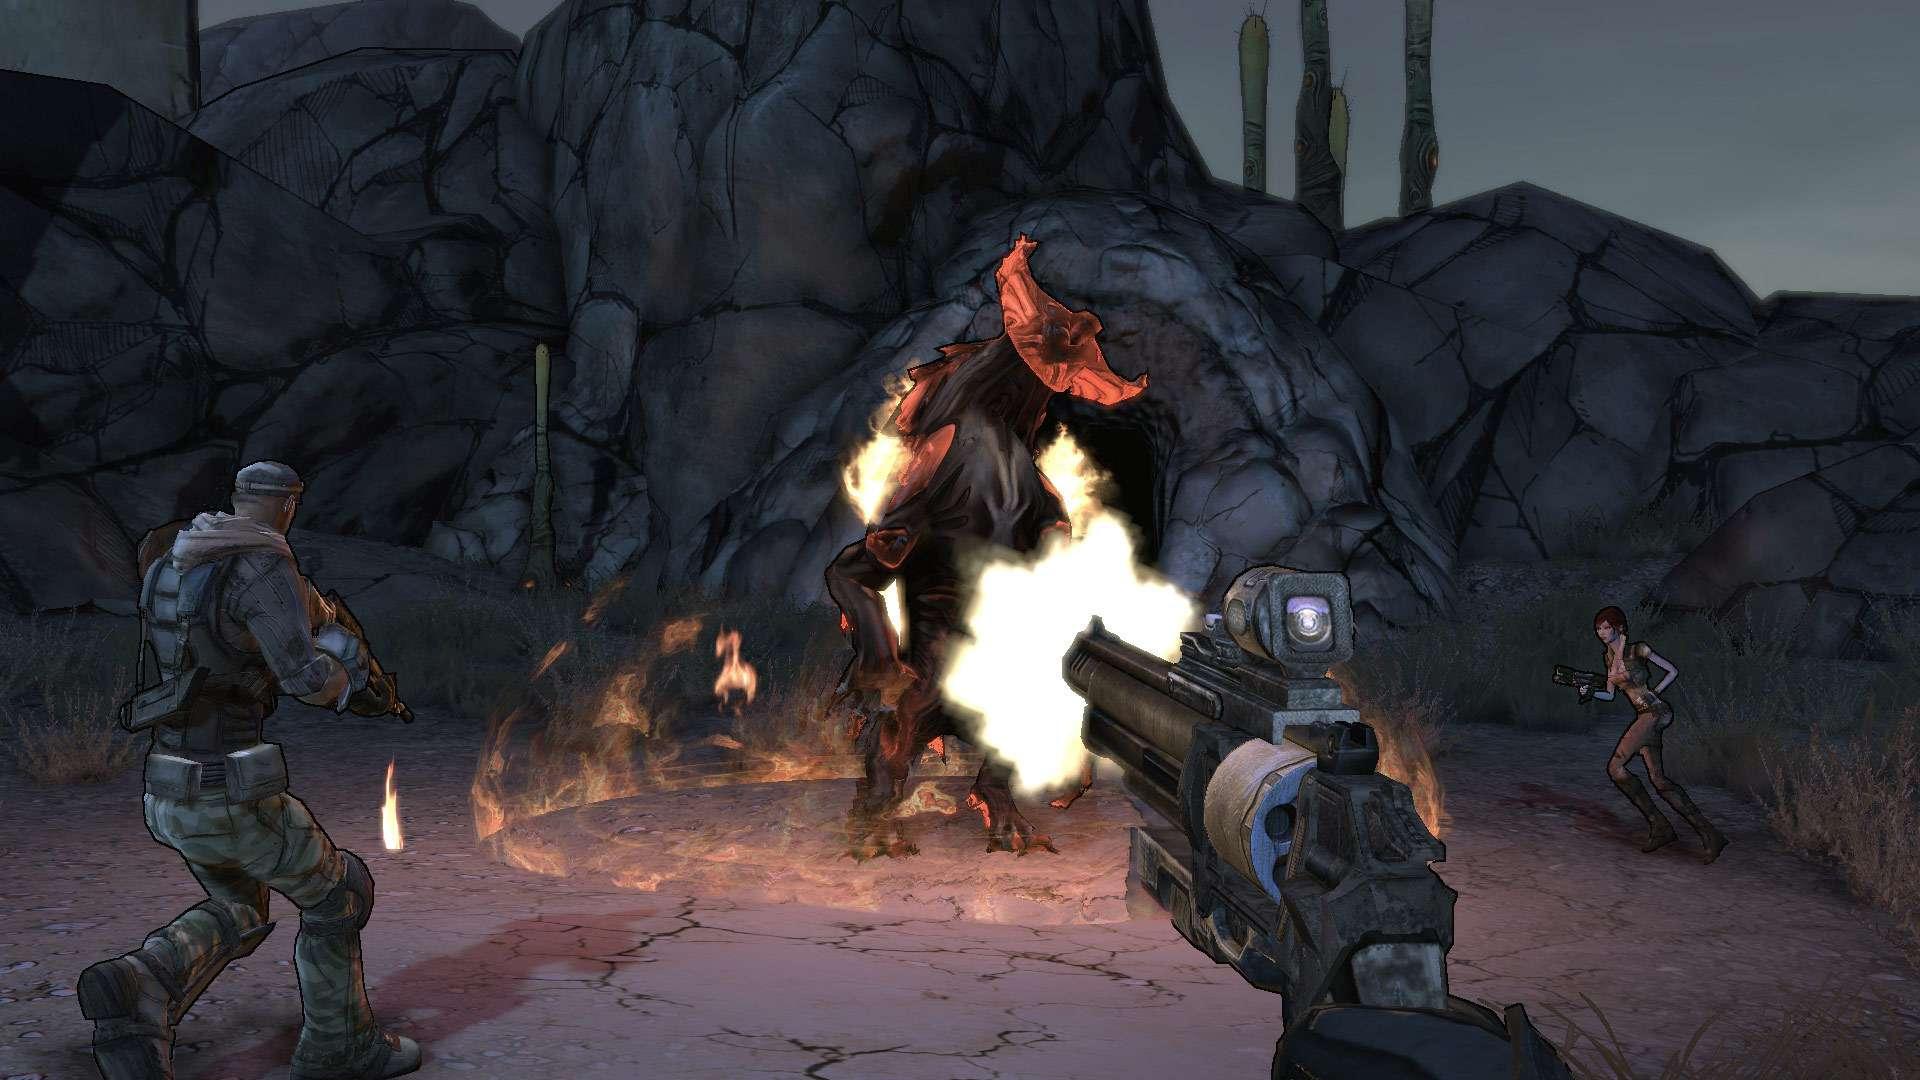 Screenshot from Borderlands (8/10)